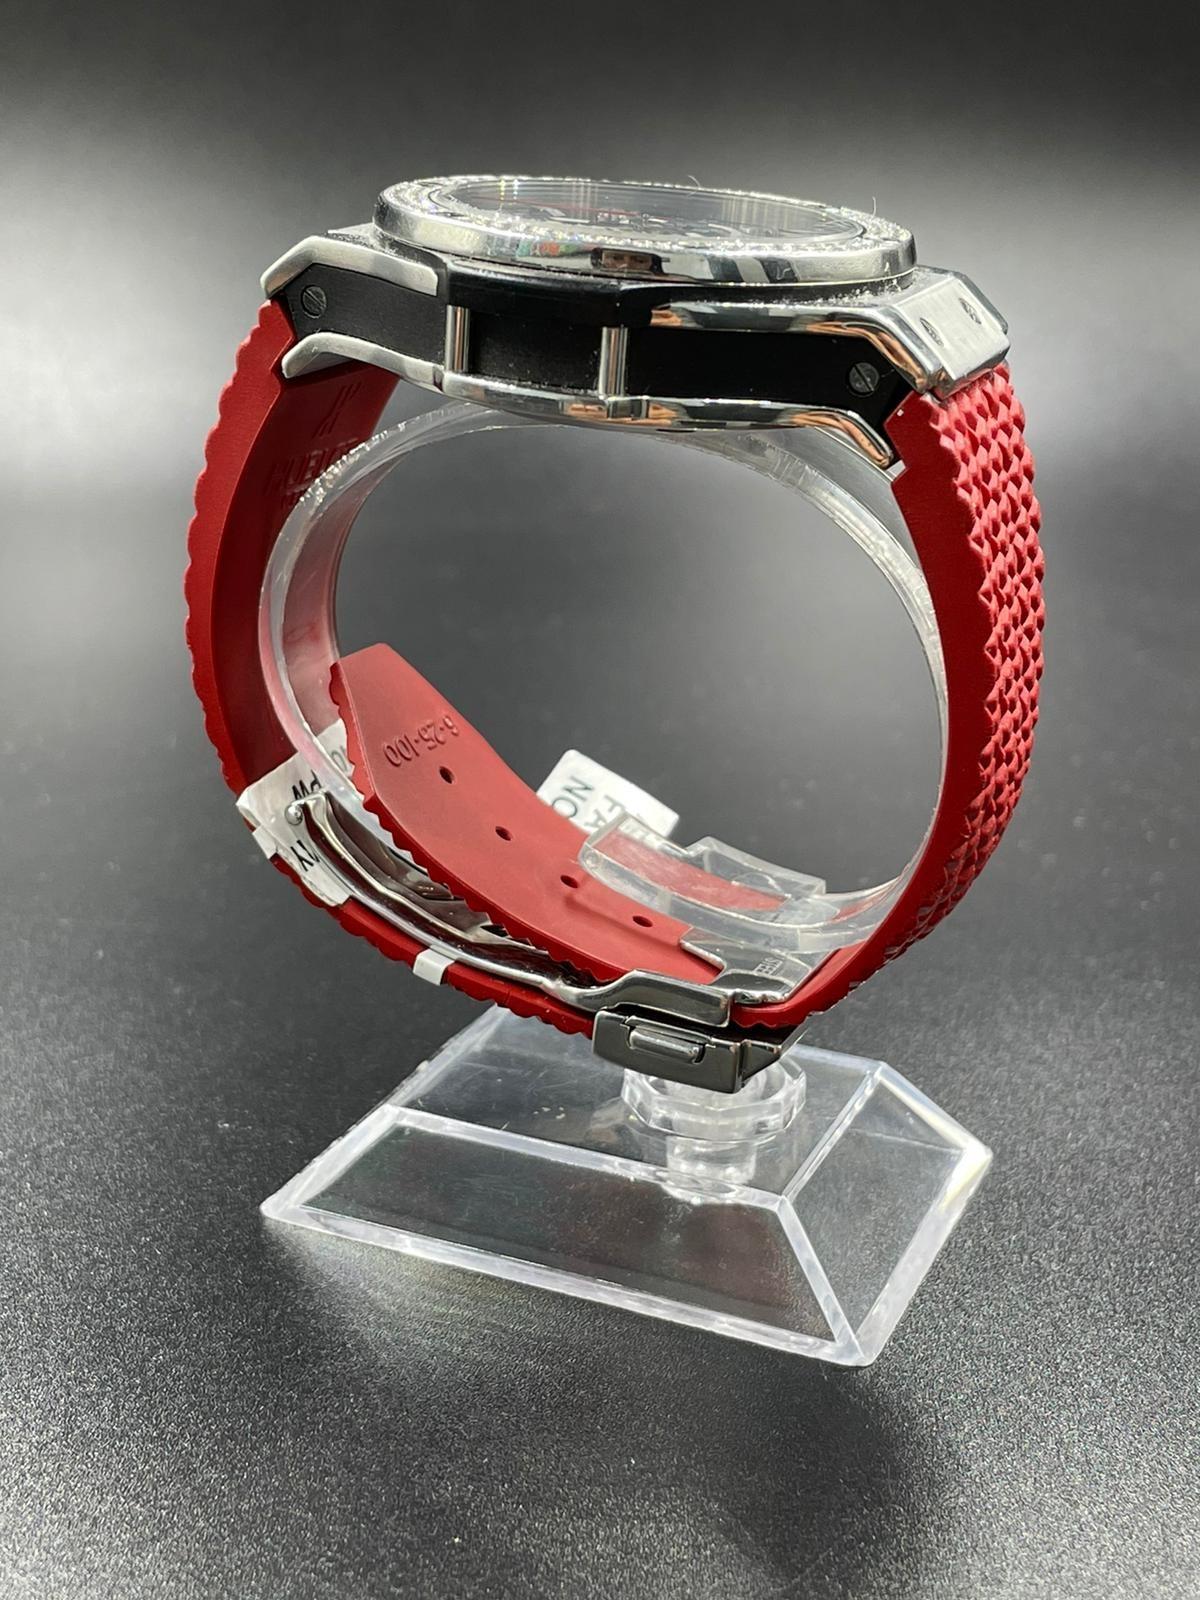 Hublot Big Bang chronometer watch with black face and original diamond dial - Image 4 of 5